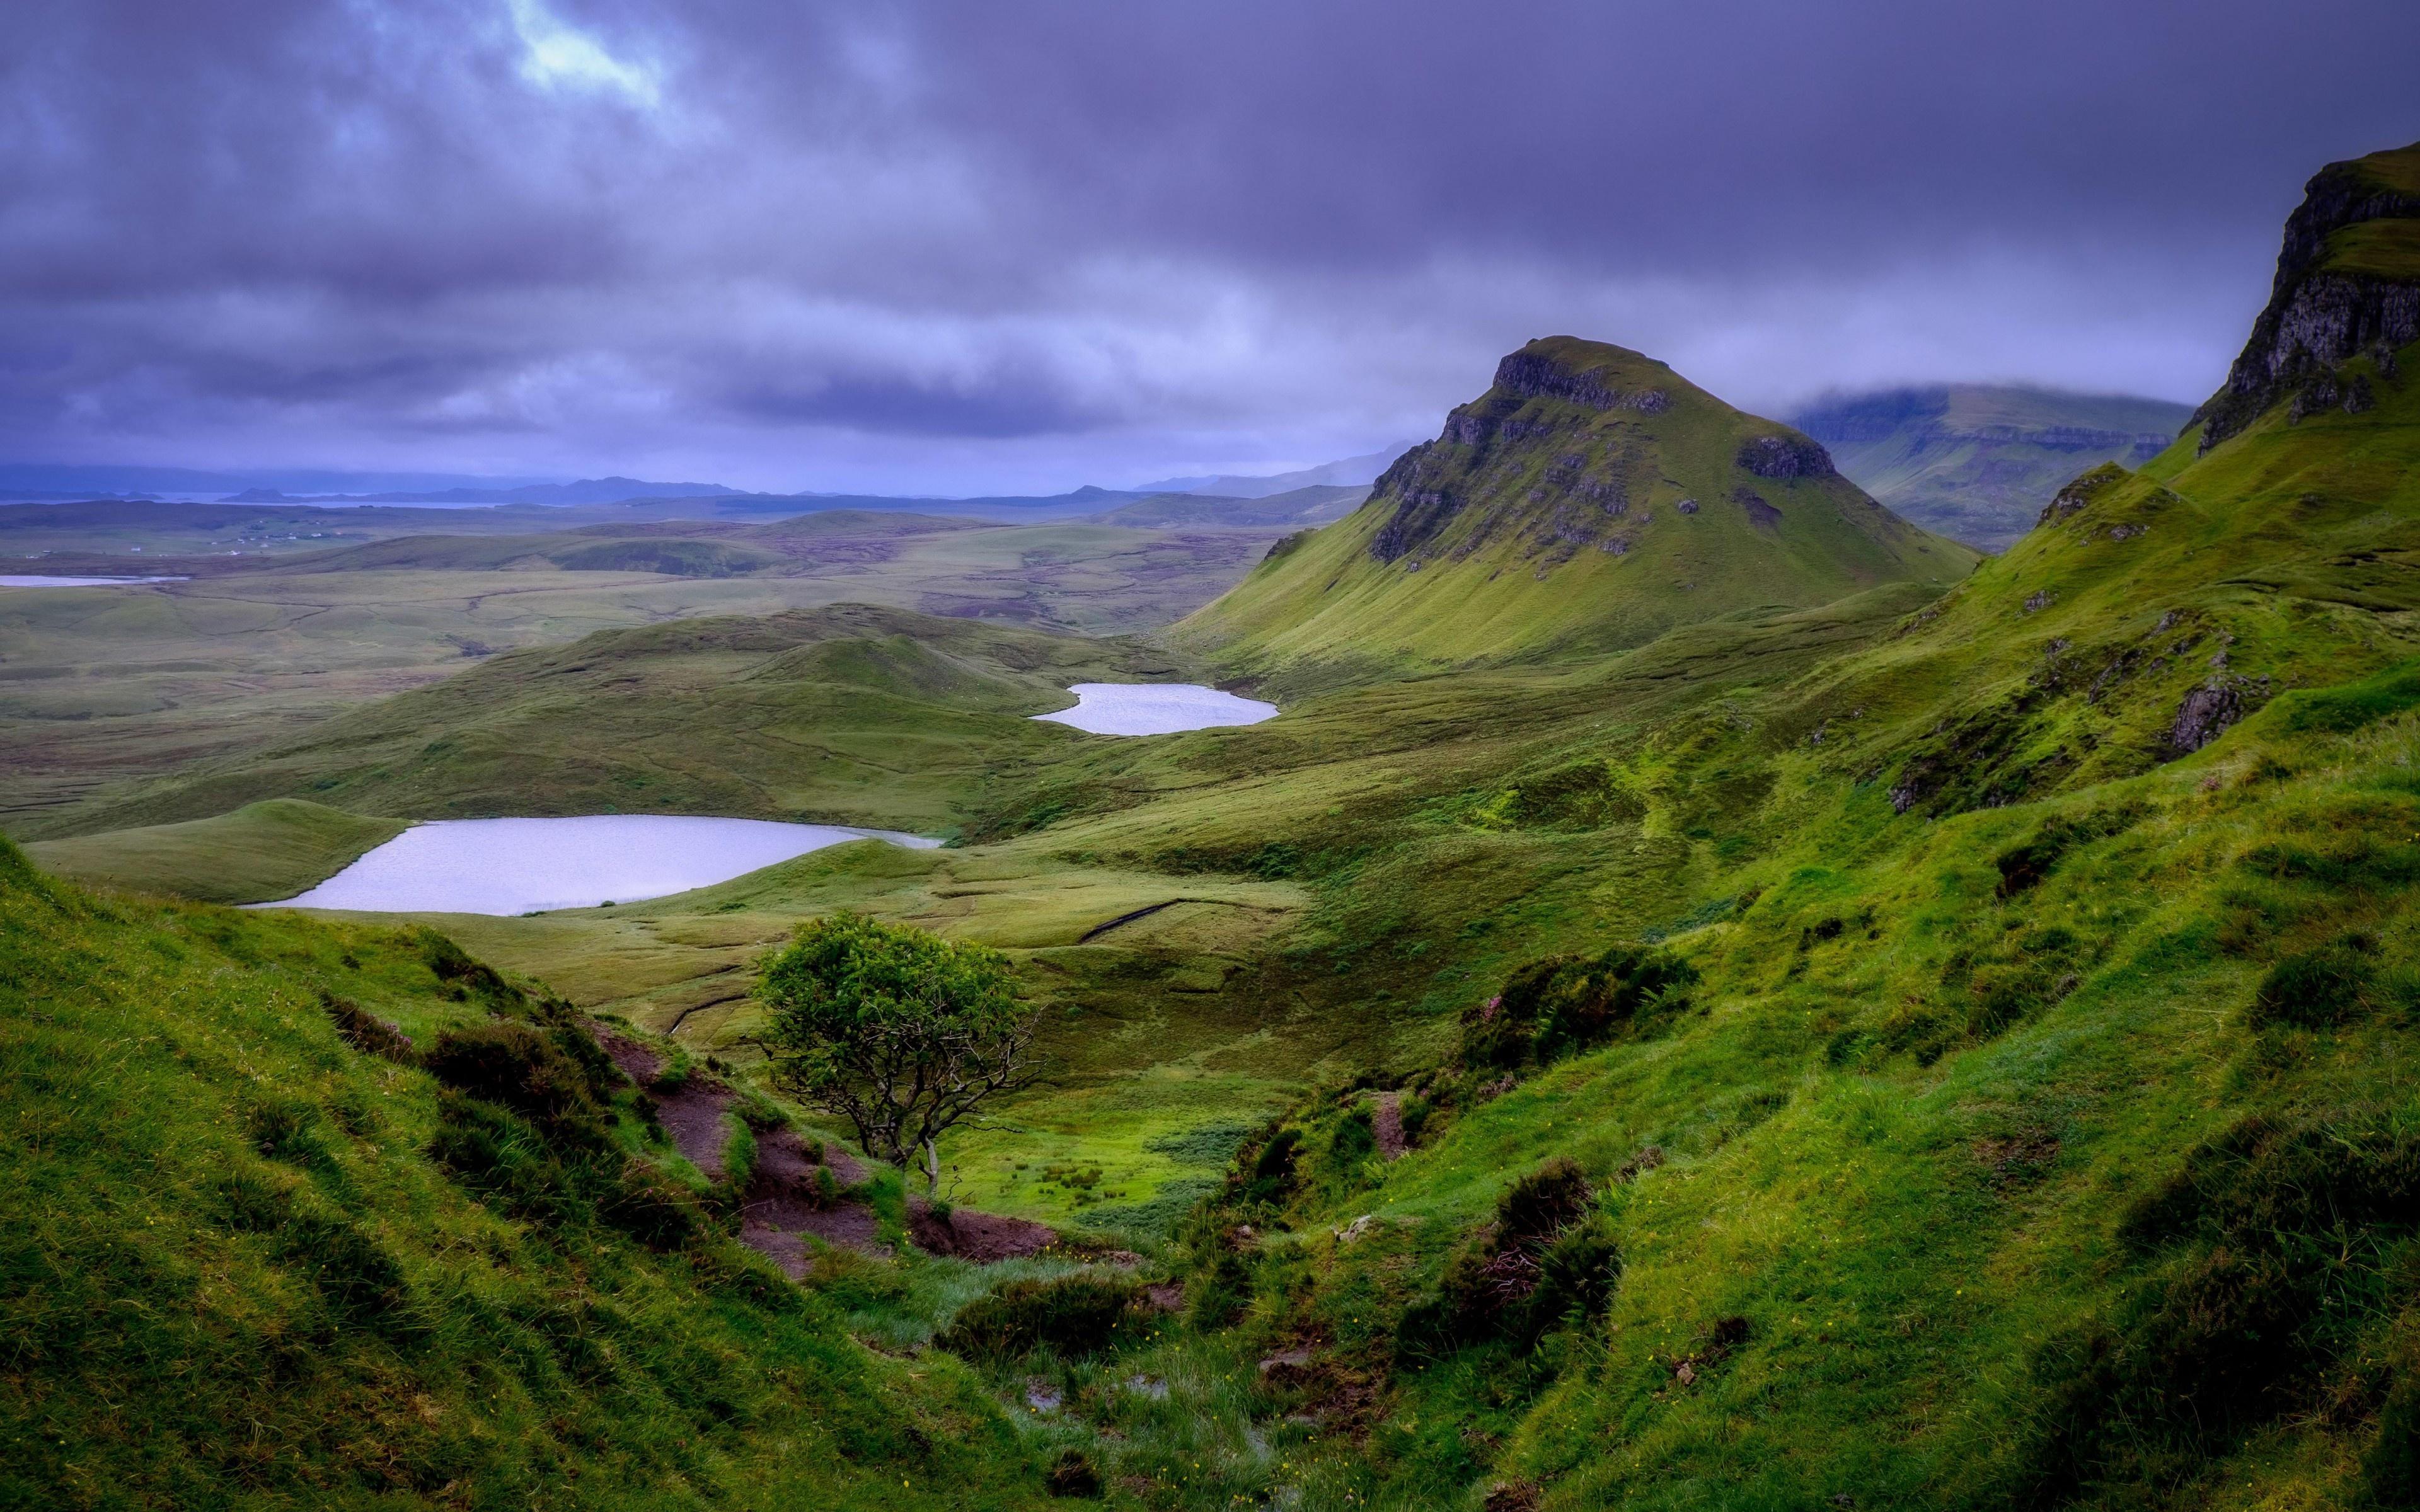 Cloud Hill Nature Rock Scotland Sky 3840x2400